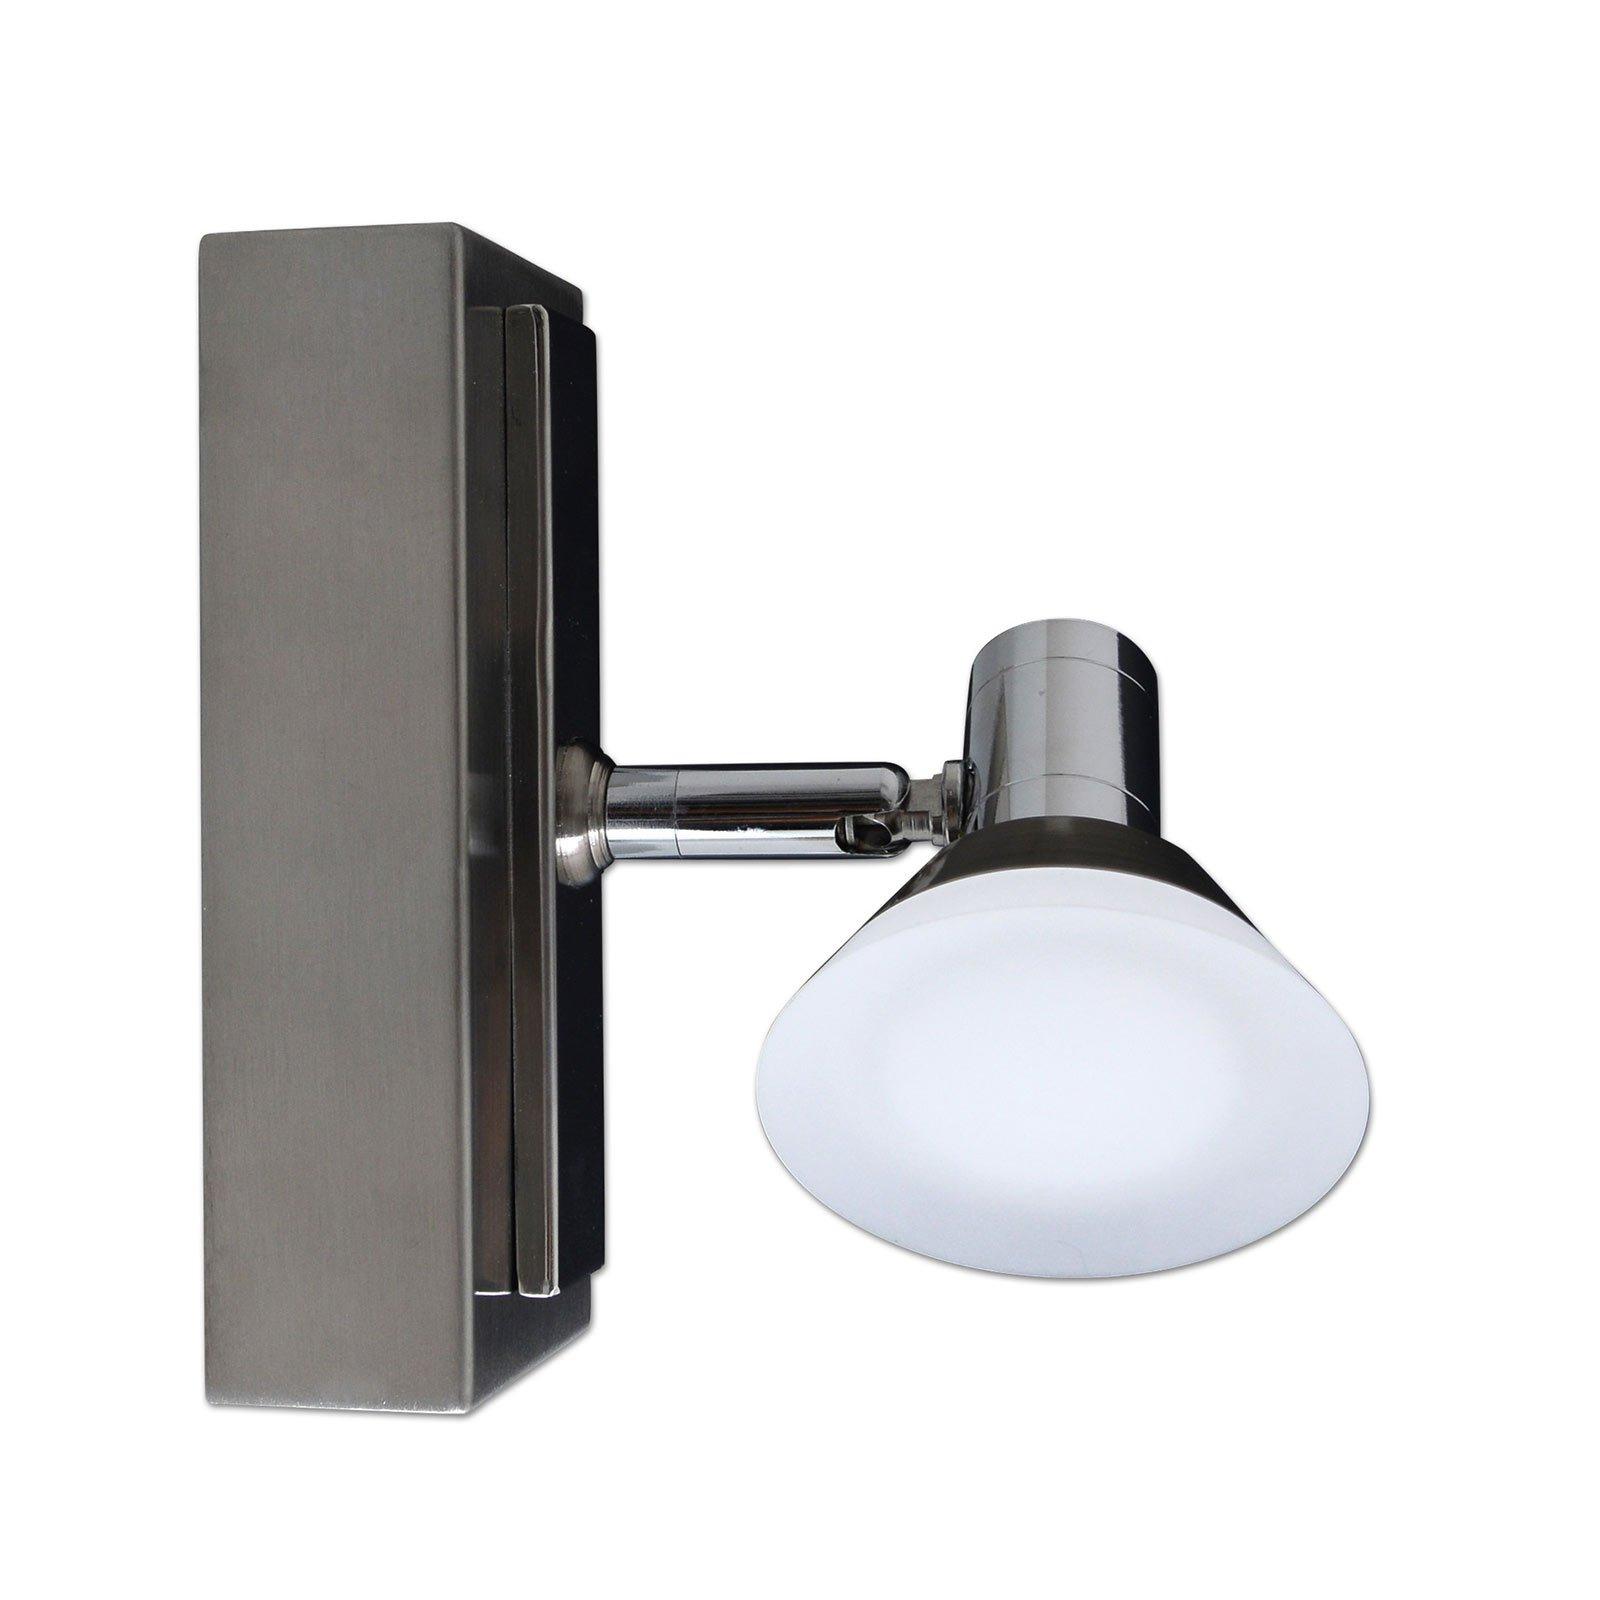 Jericho LED-vegglampe 1 lyskilde